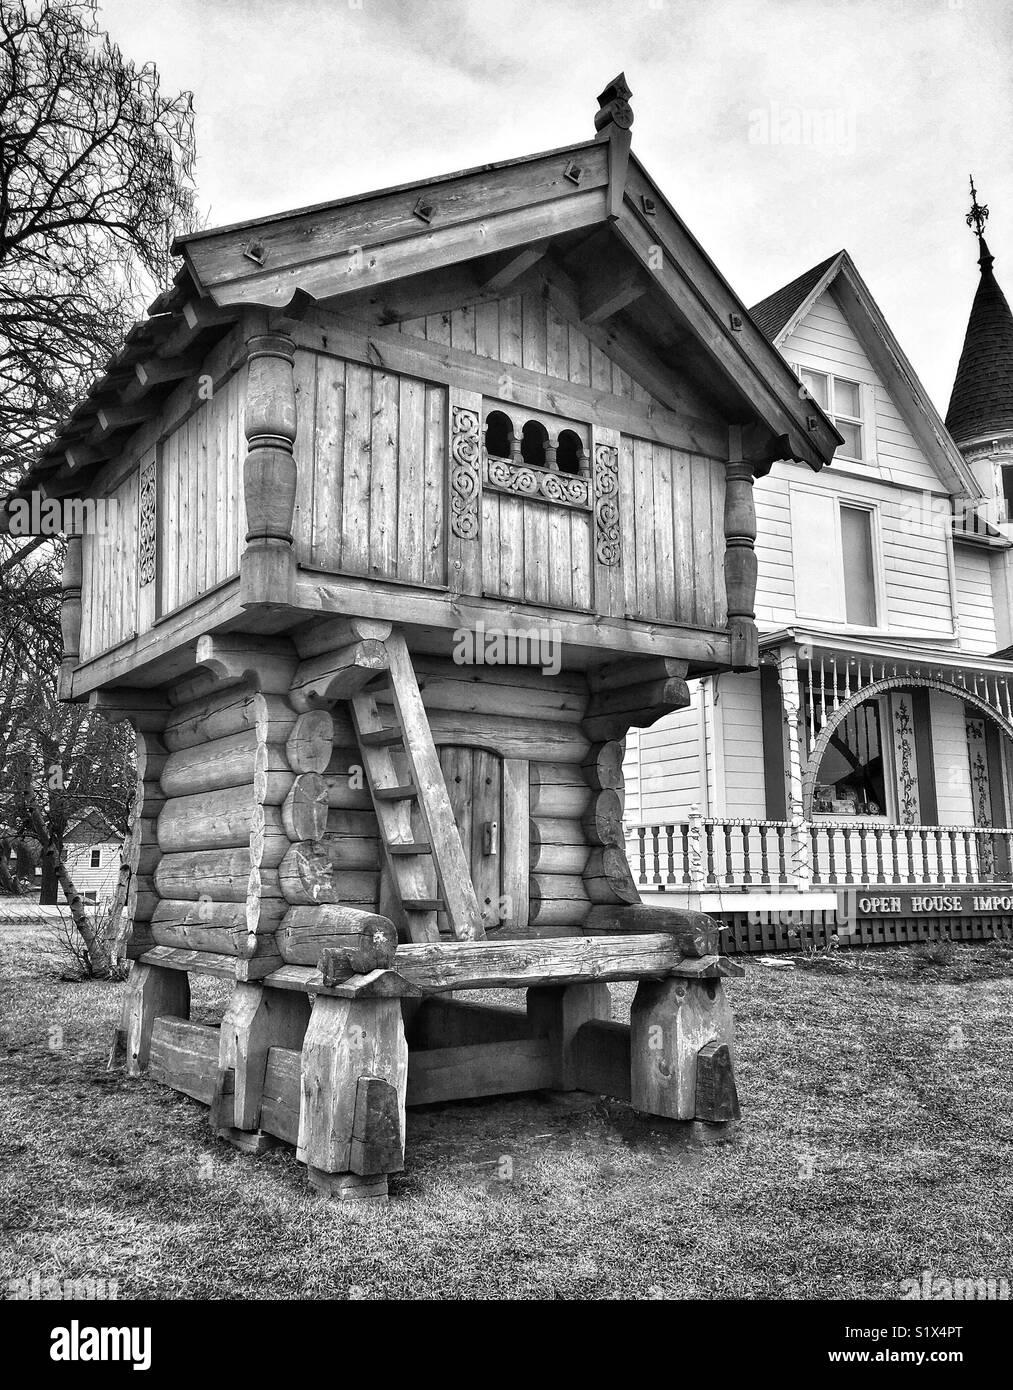 Traditional Scandinavian stabbur next to Victorian Home, Mount Horeb